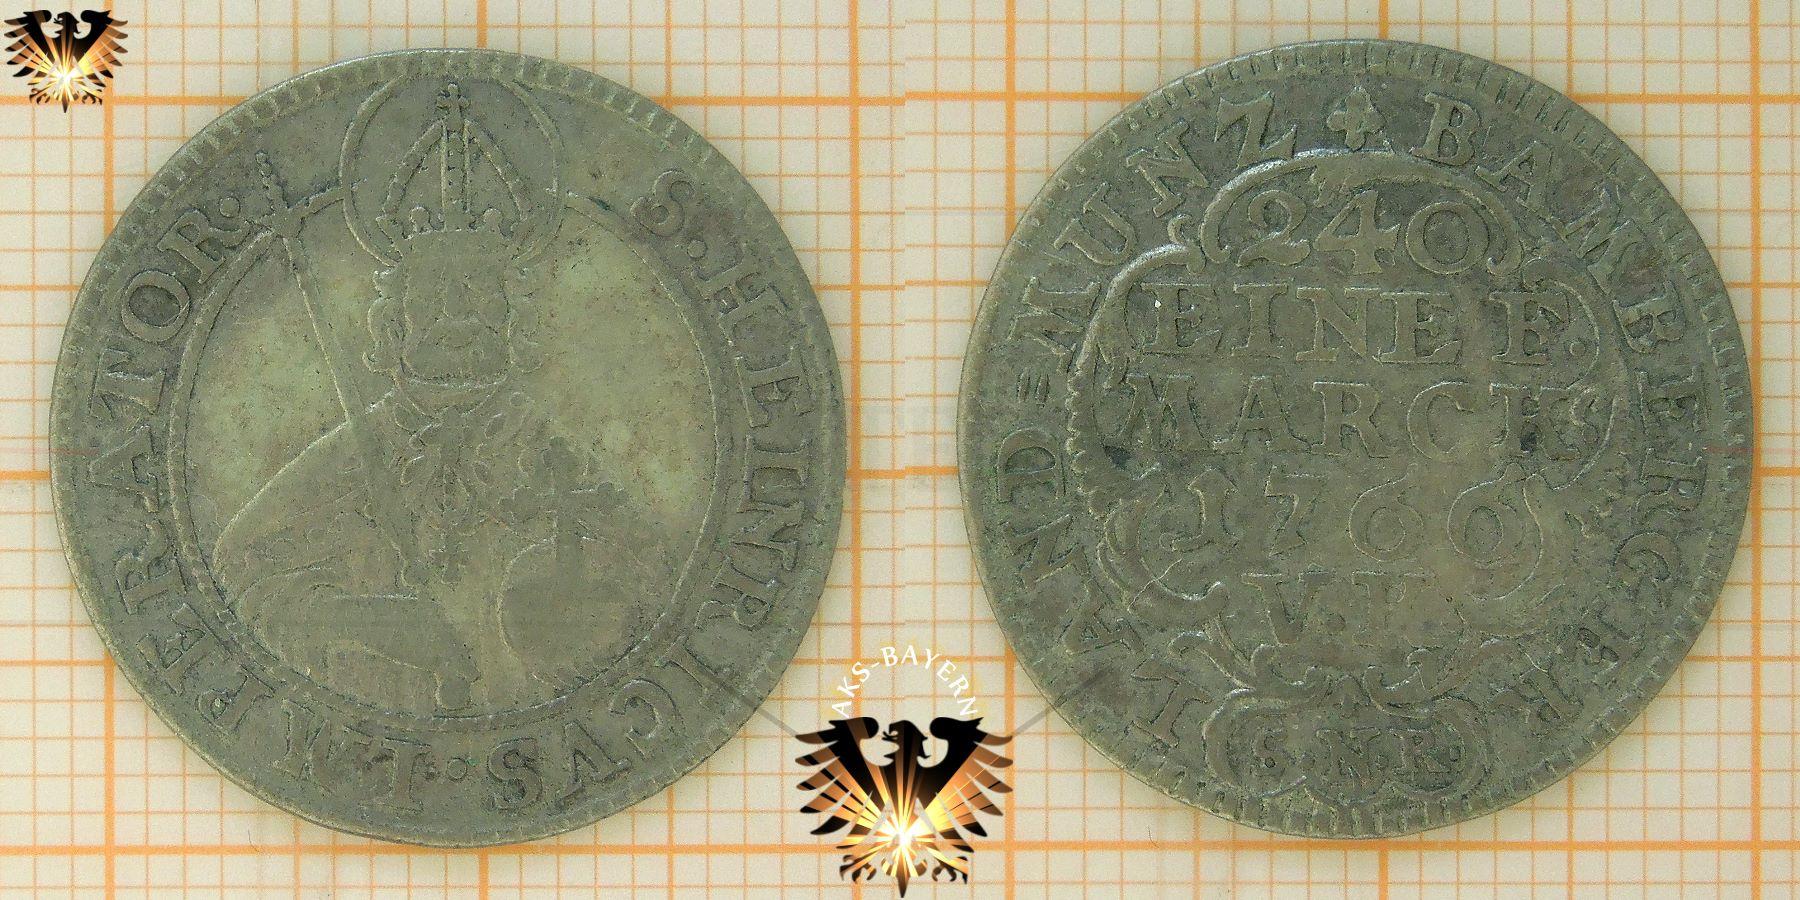 Bamberg 1766 V Kreuzer 240 Eine F Marck Münze